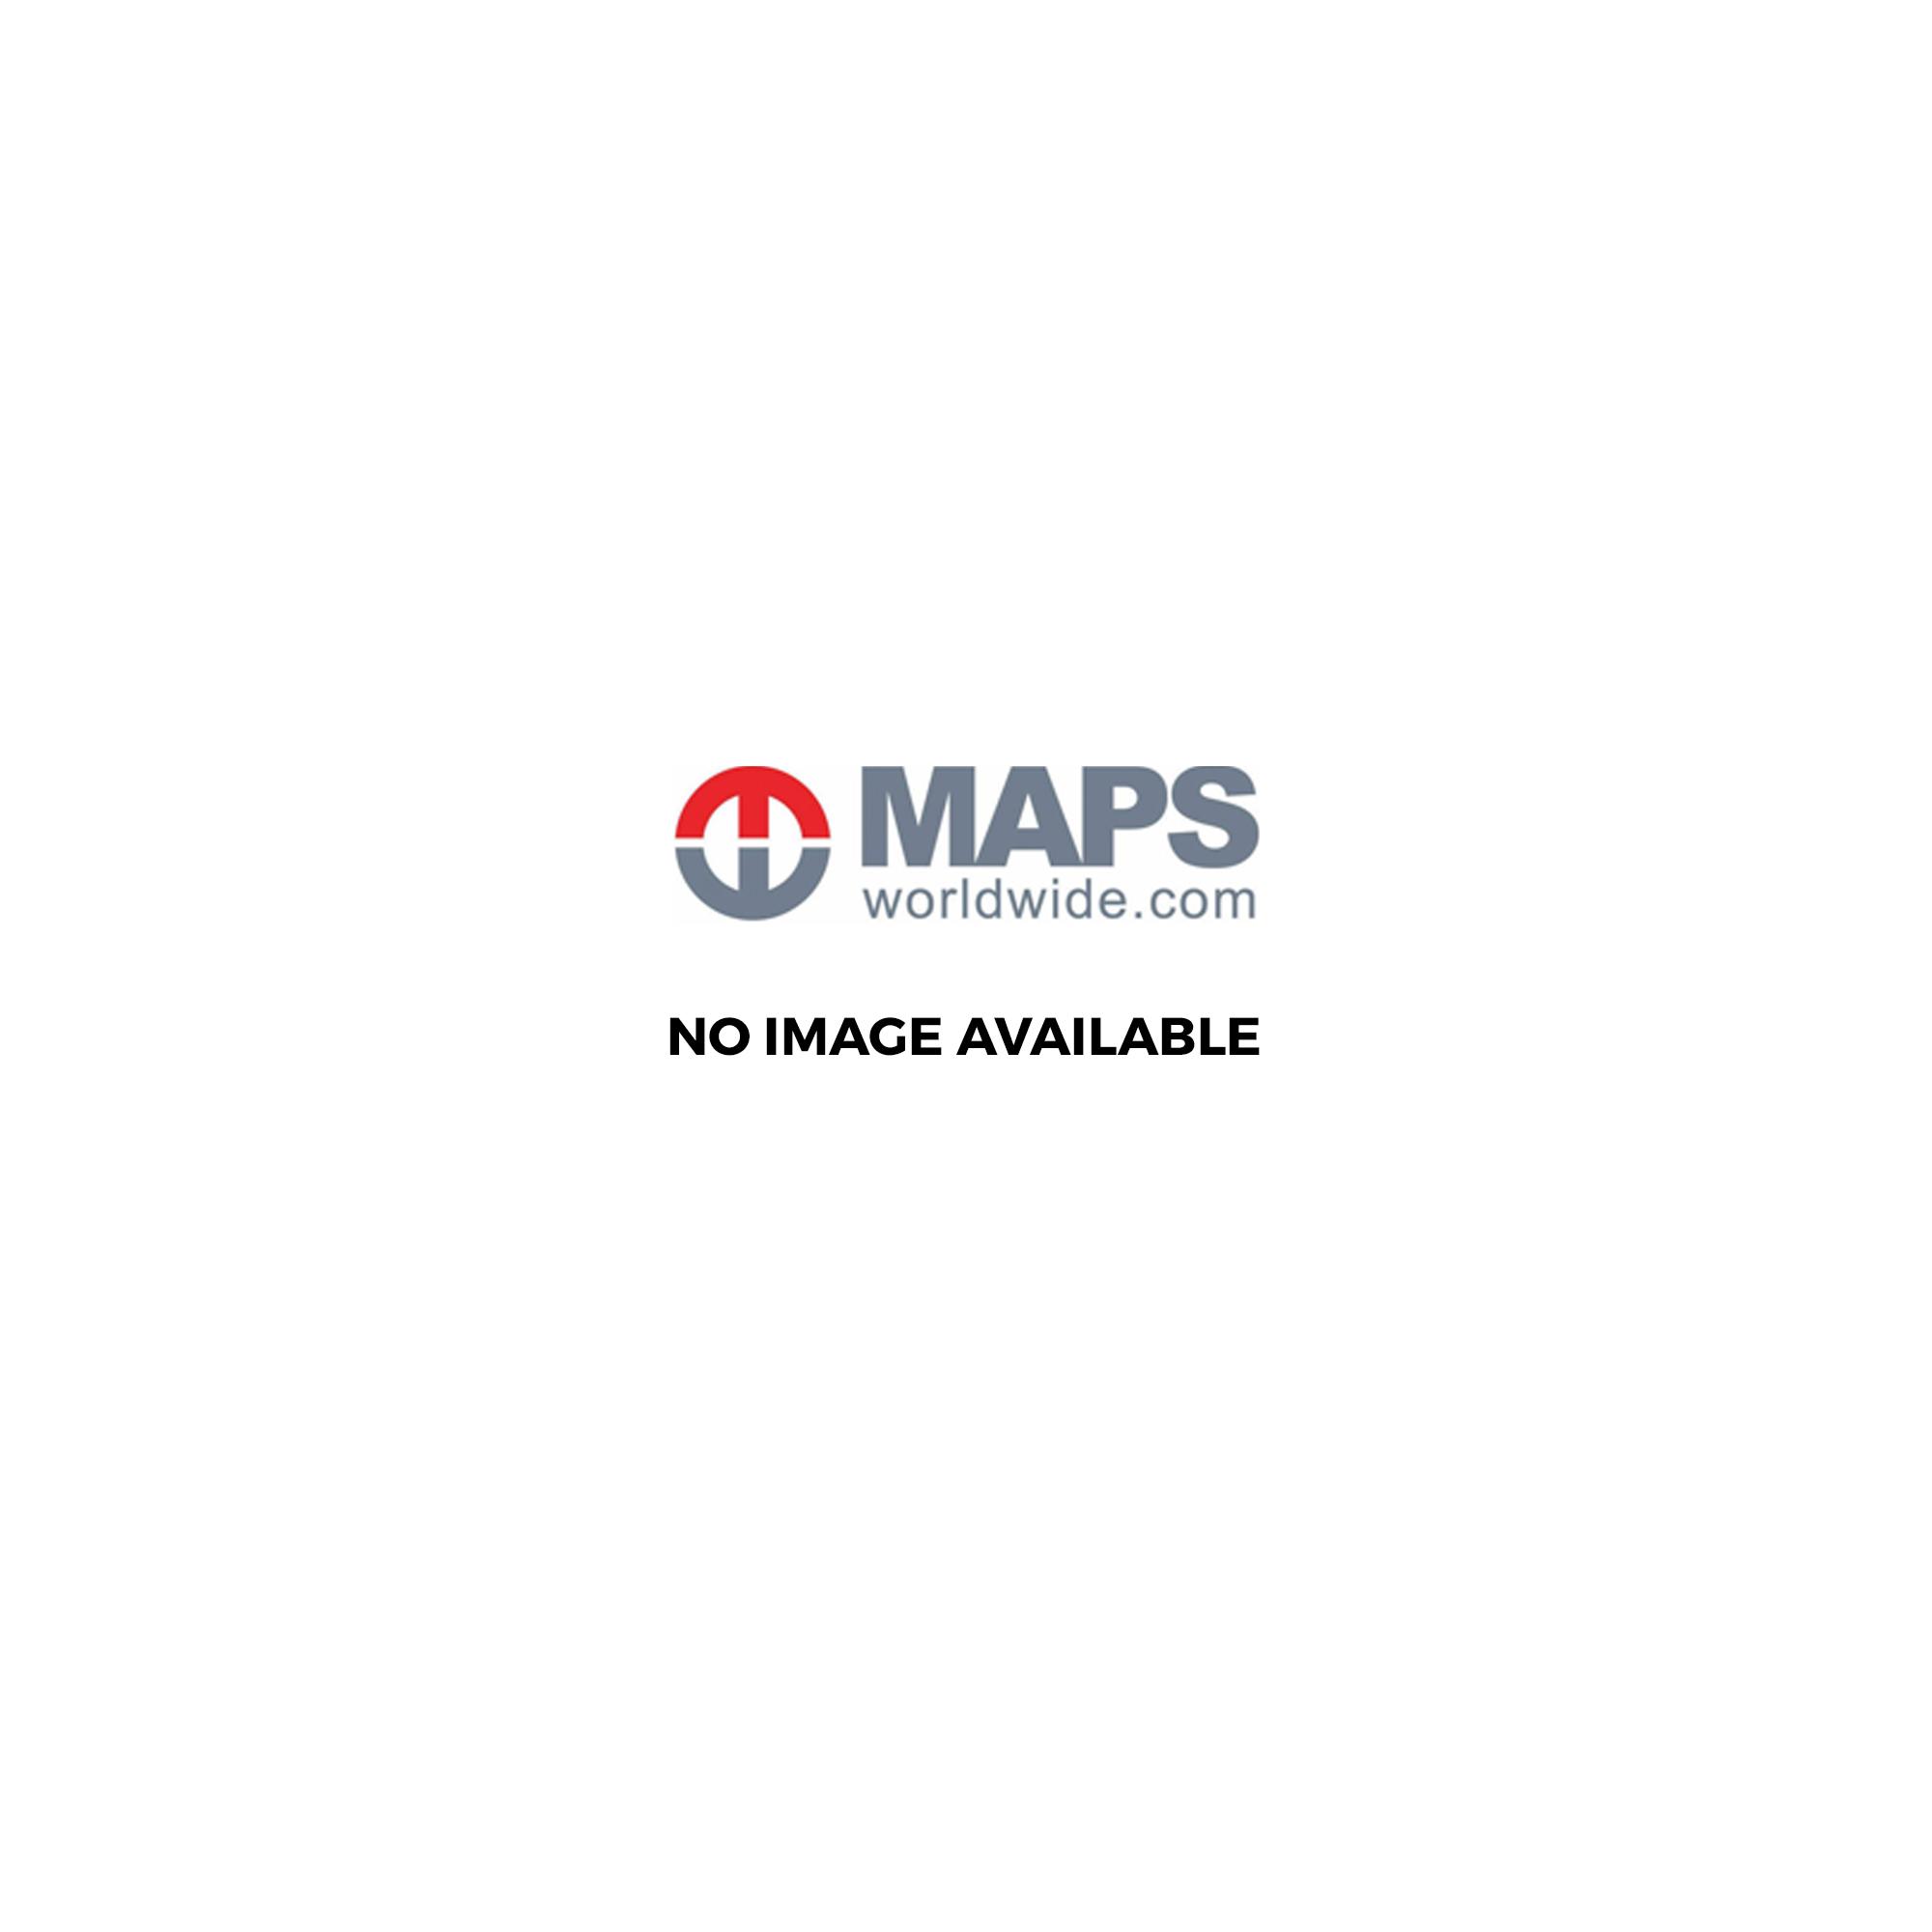 New Zealand Road Map.New Zealand Road Map